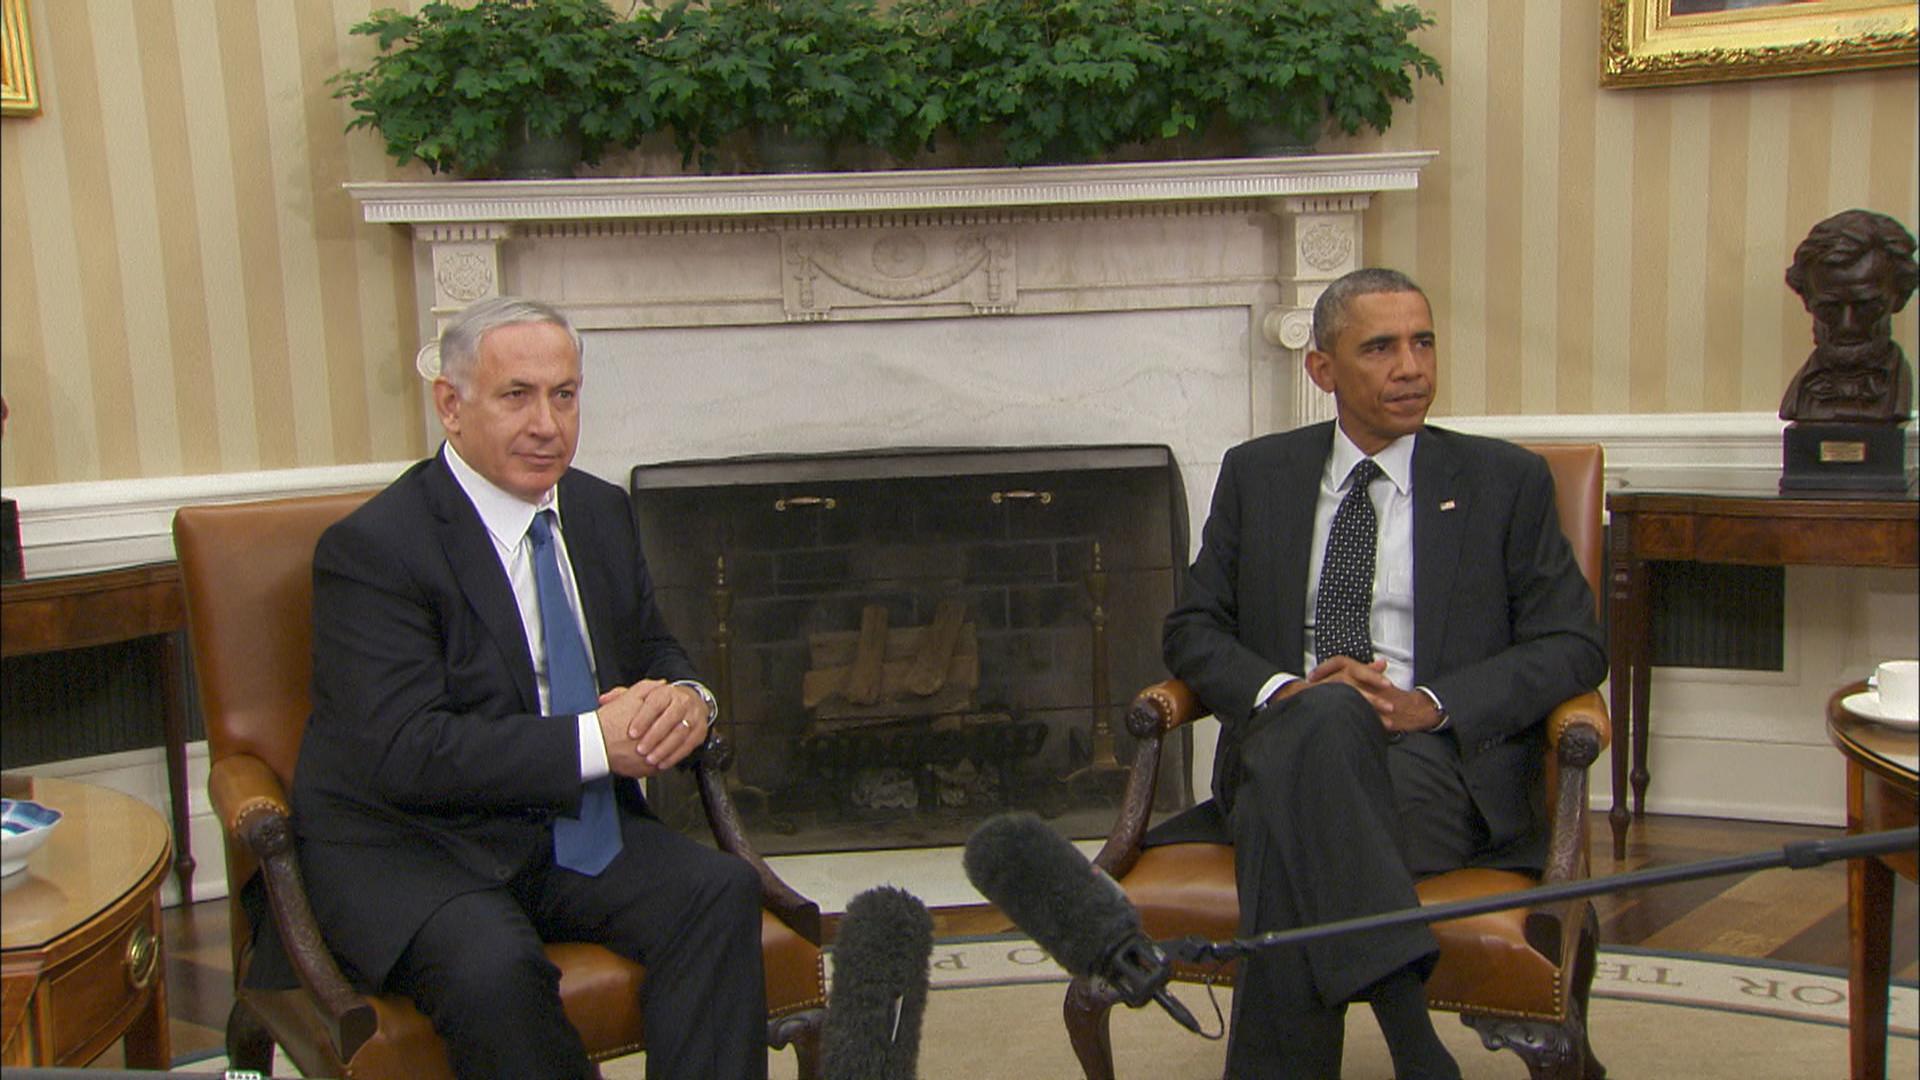 Obama, Netanyahu stress 'bond of friendship'